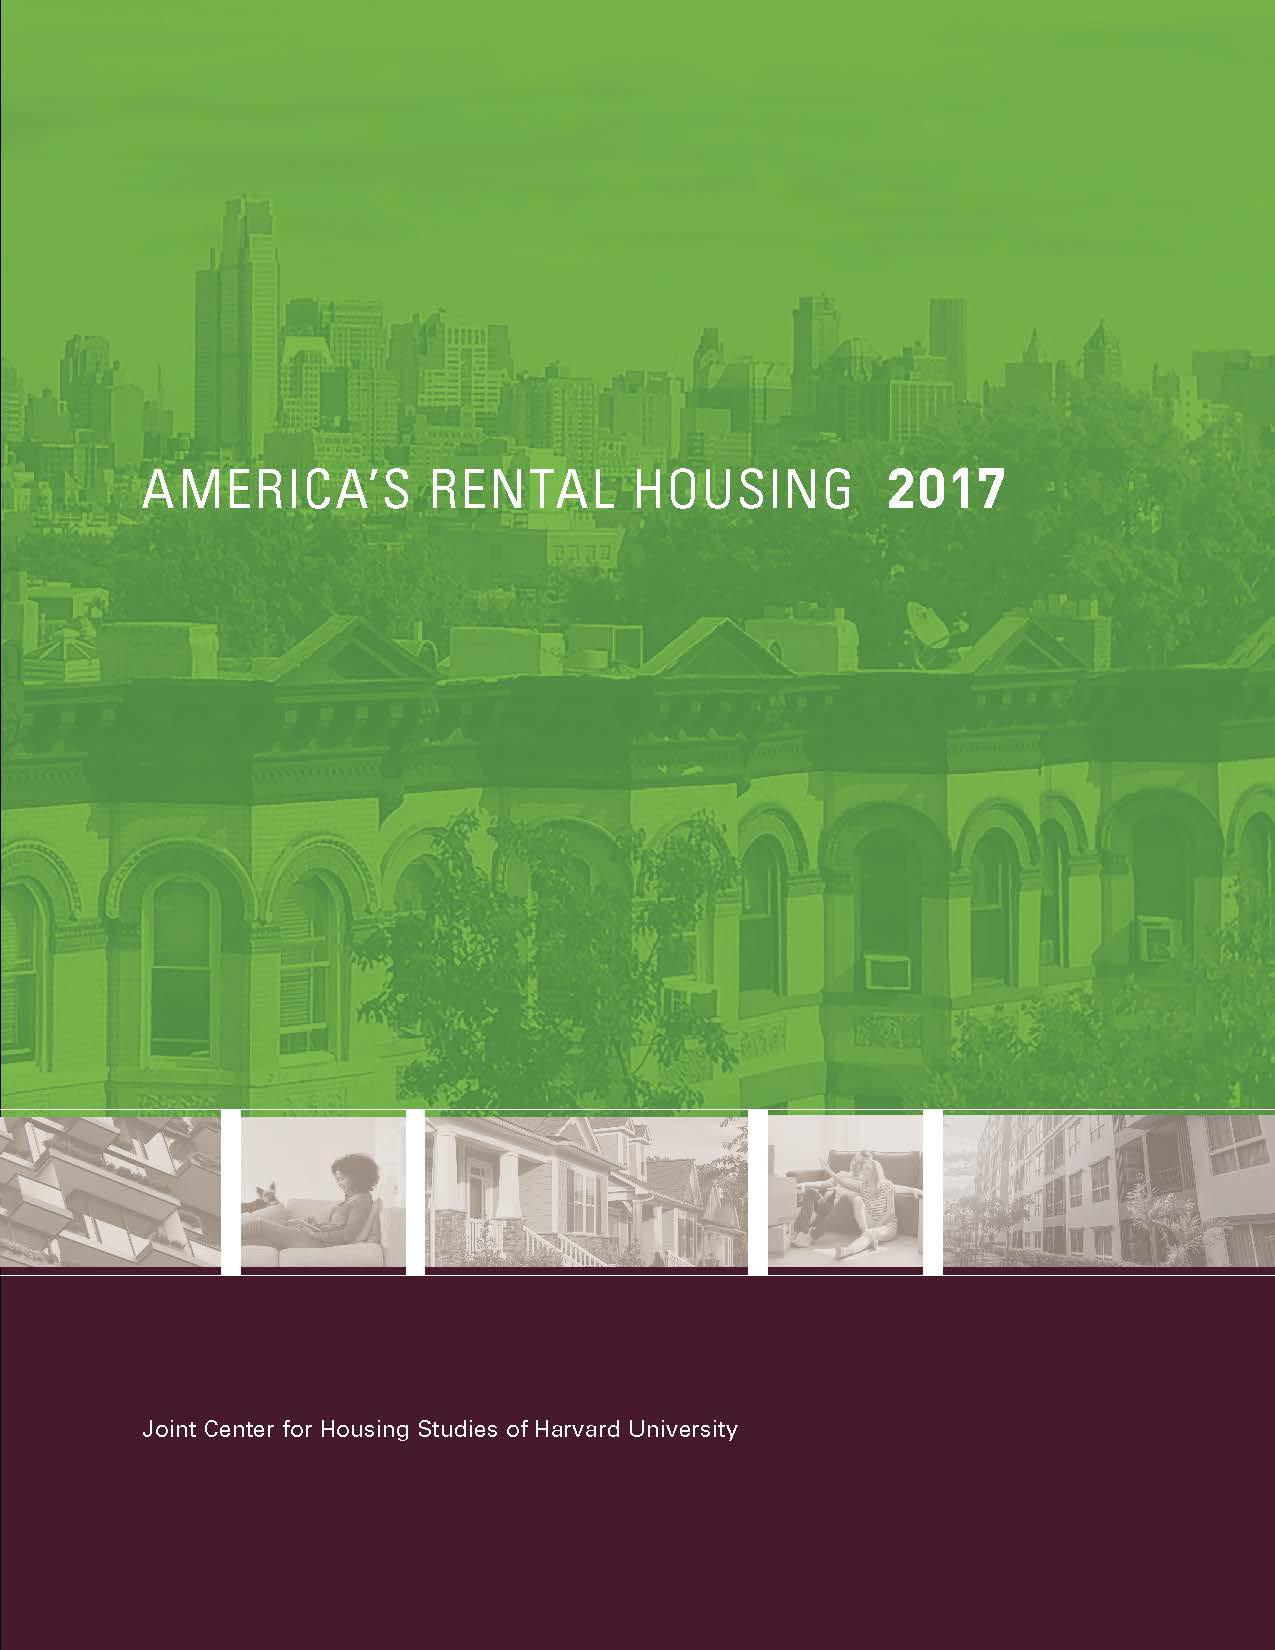 America's Rental Housing 2017